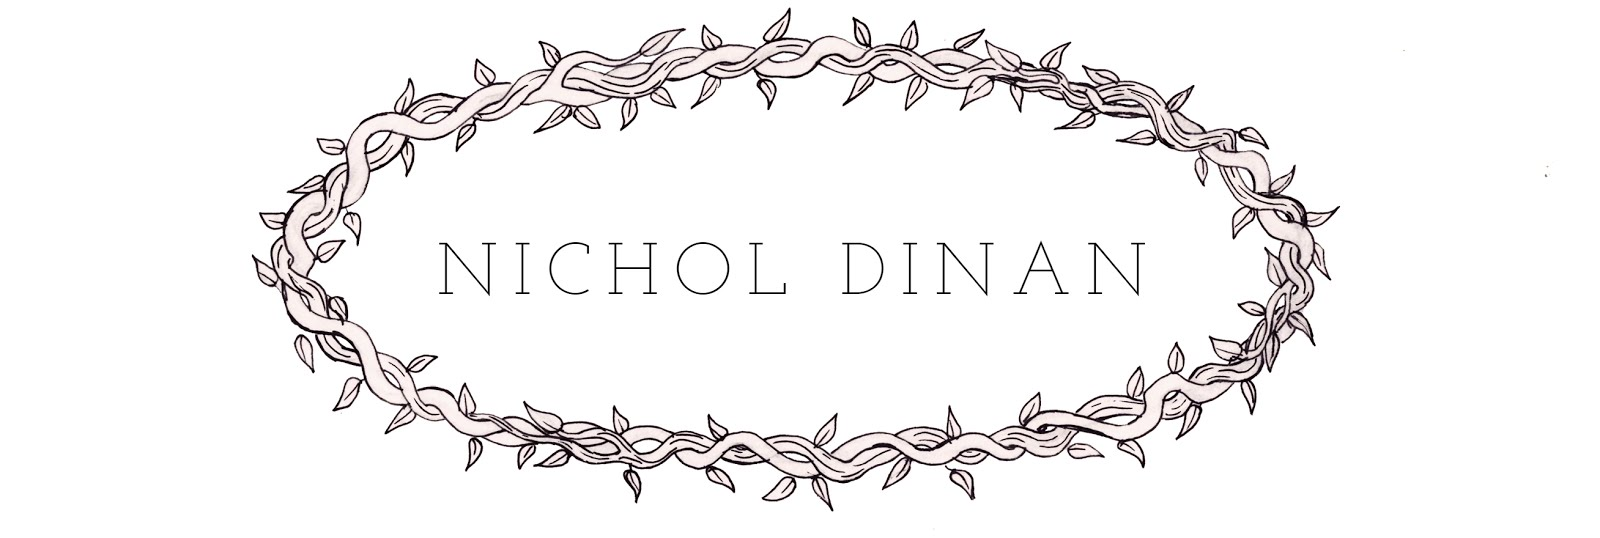 Nichol Dinan